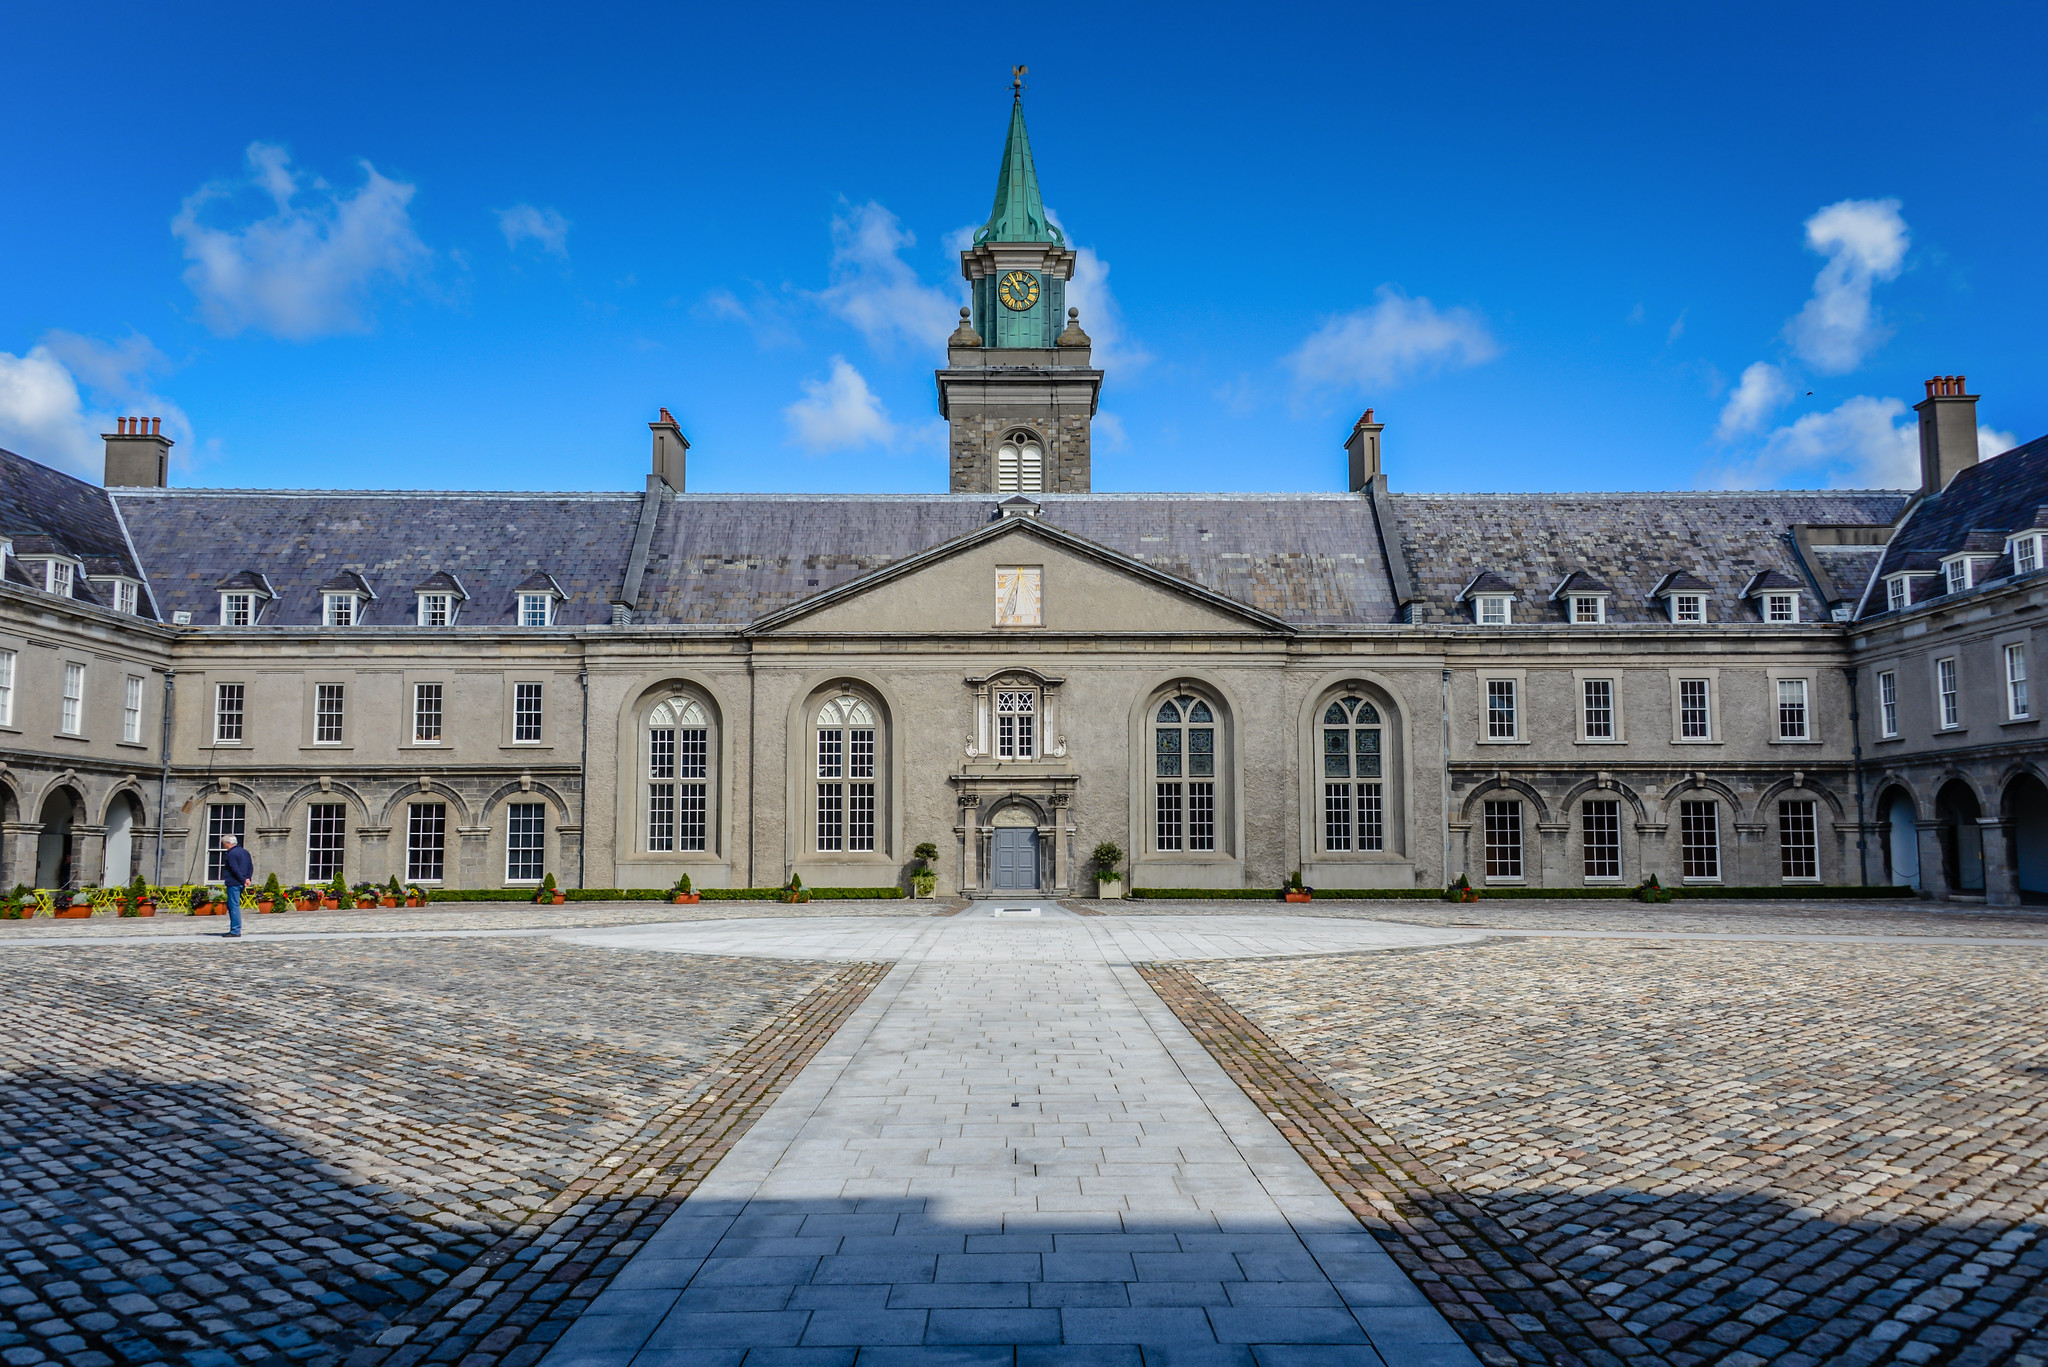 Irish Museum of Modern Art (Former Royal Hospital Kilmainham) - Dublin Ireland